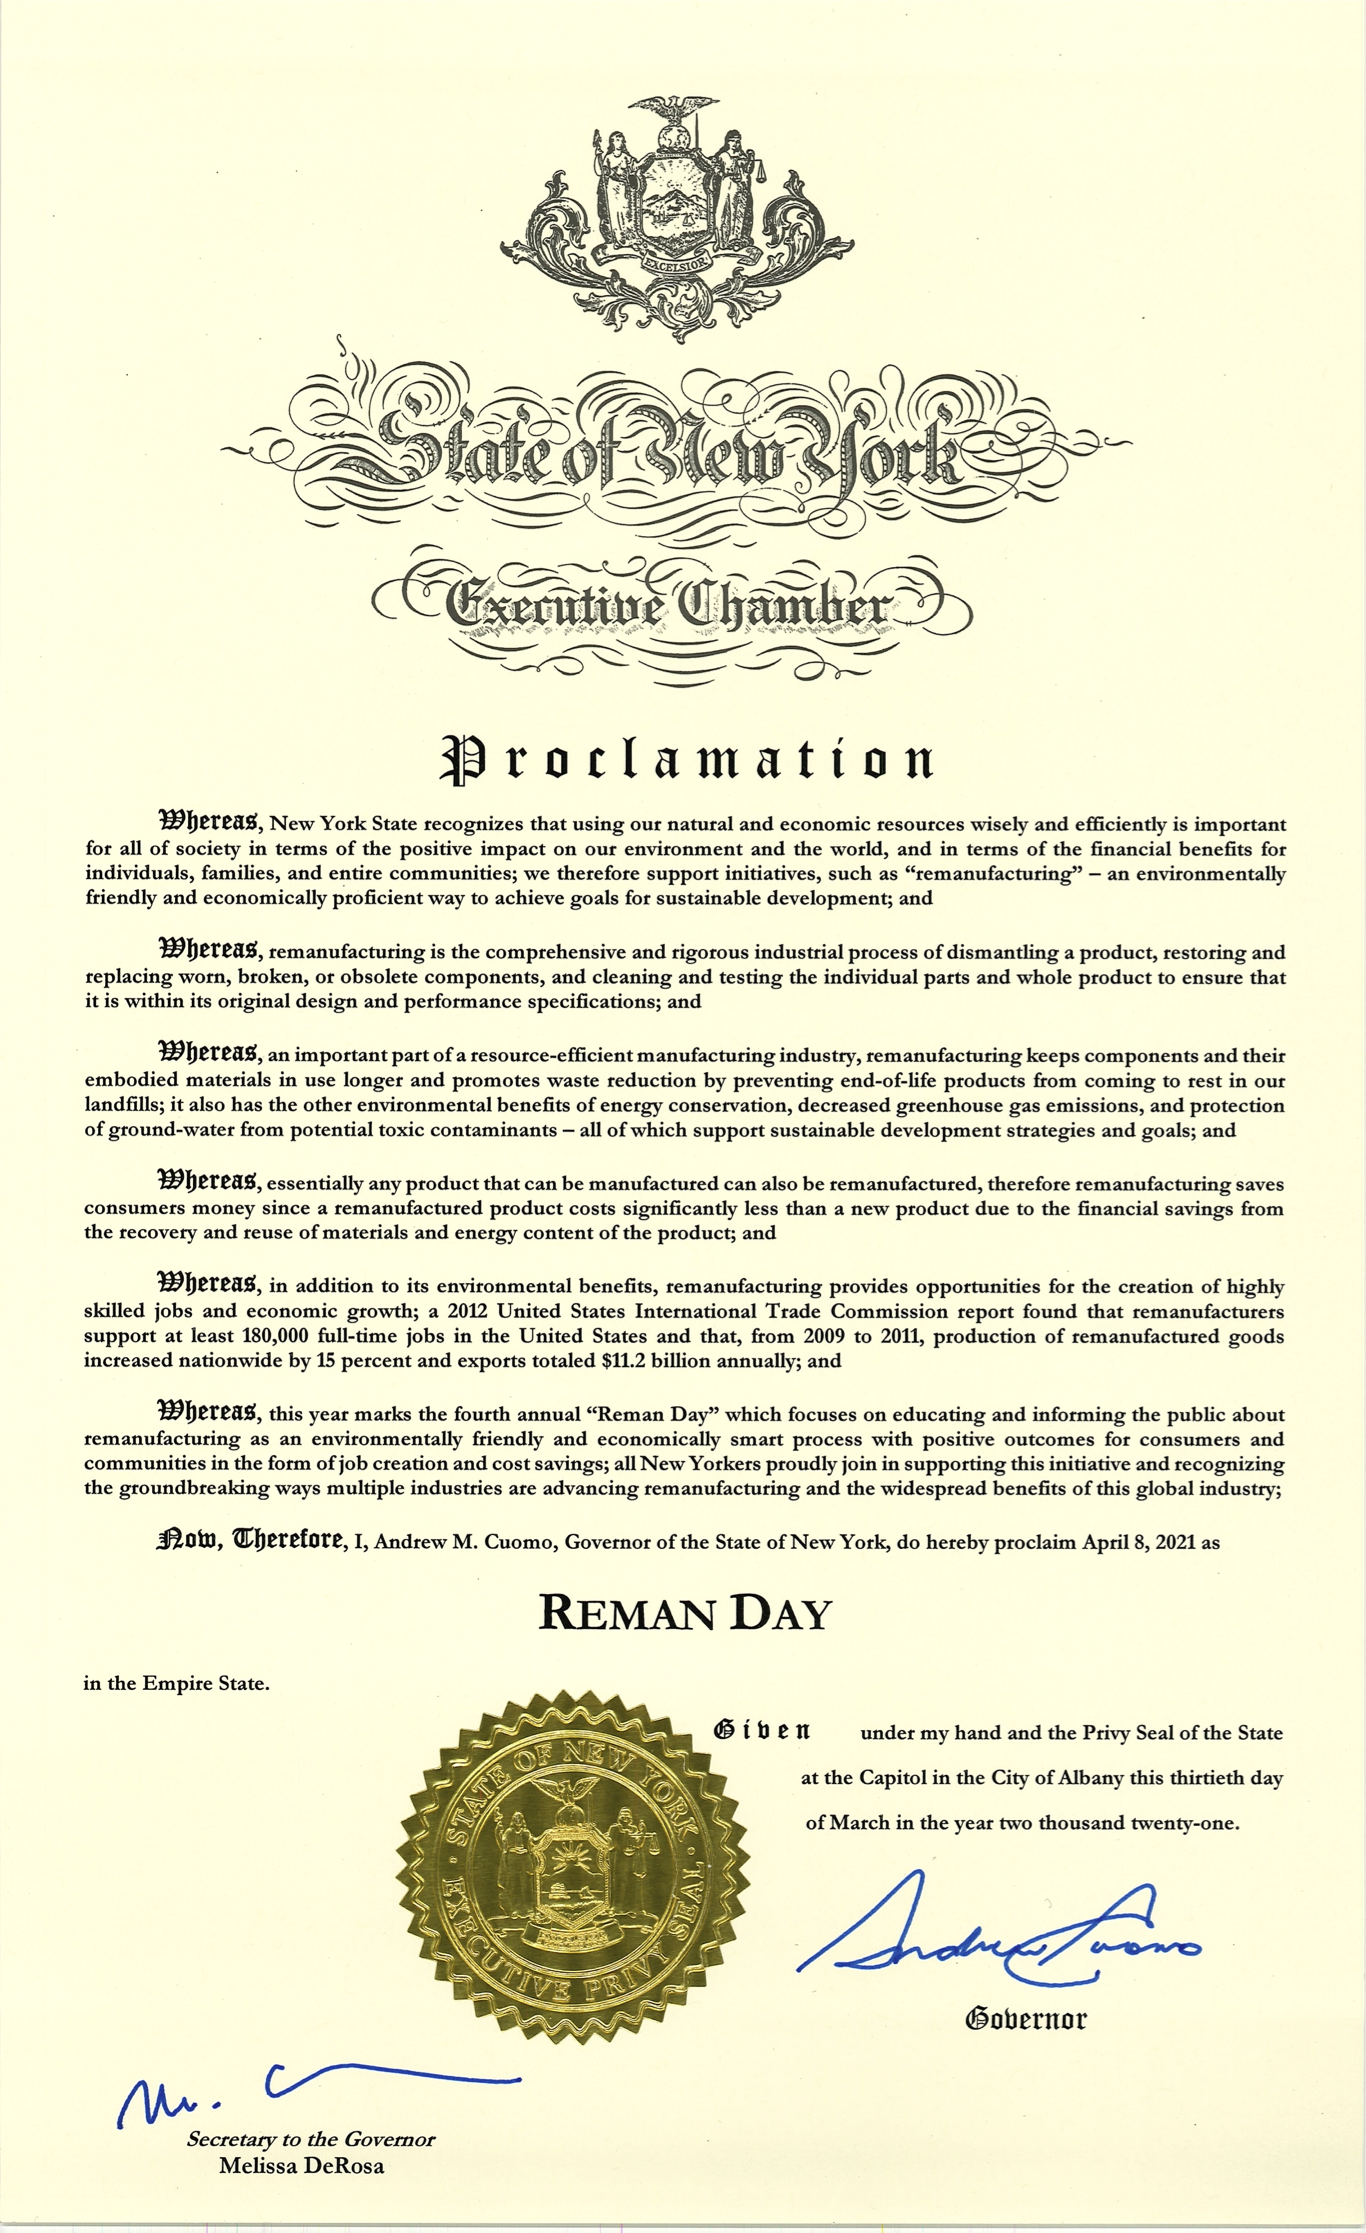 New York Proclamation